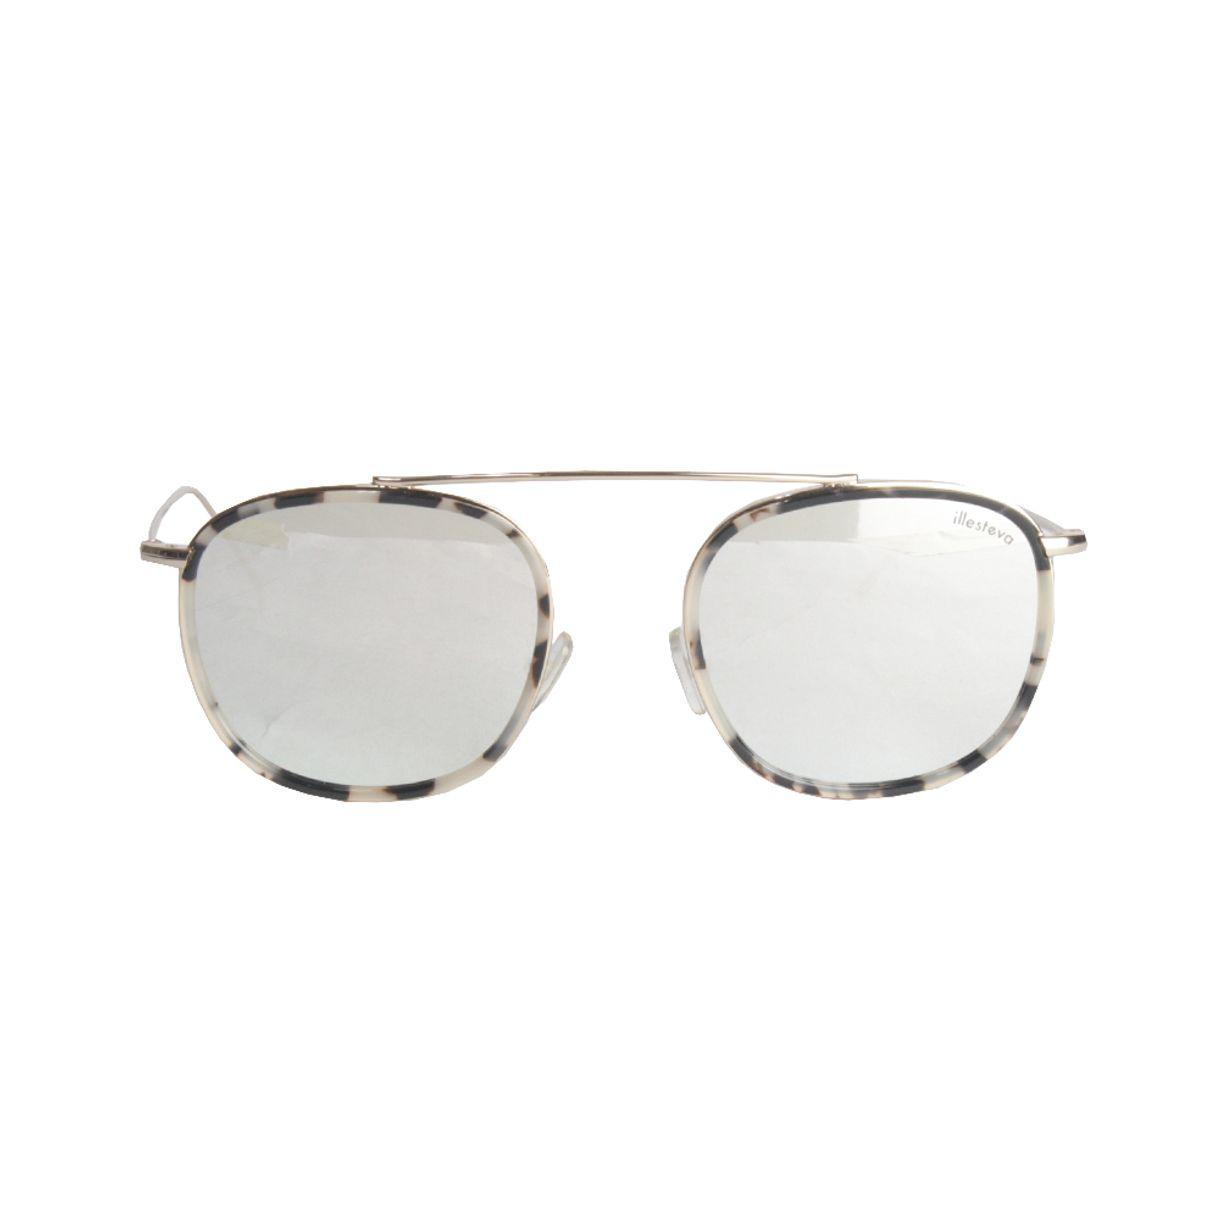 Oculos-Illesteva-Mykonos-Ace-Espelhado